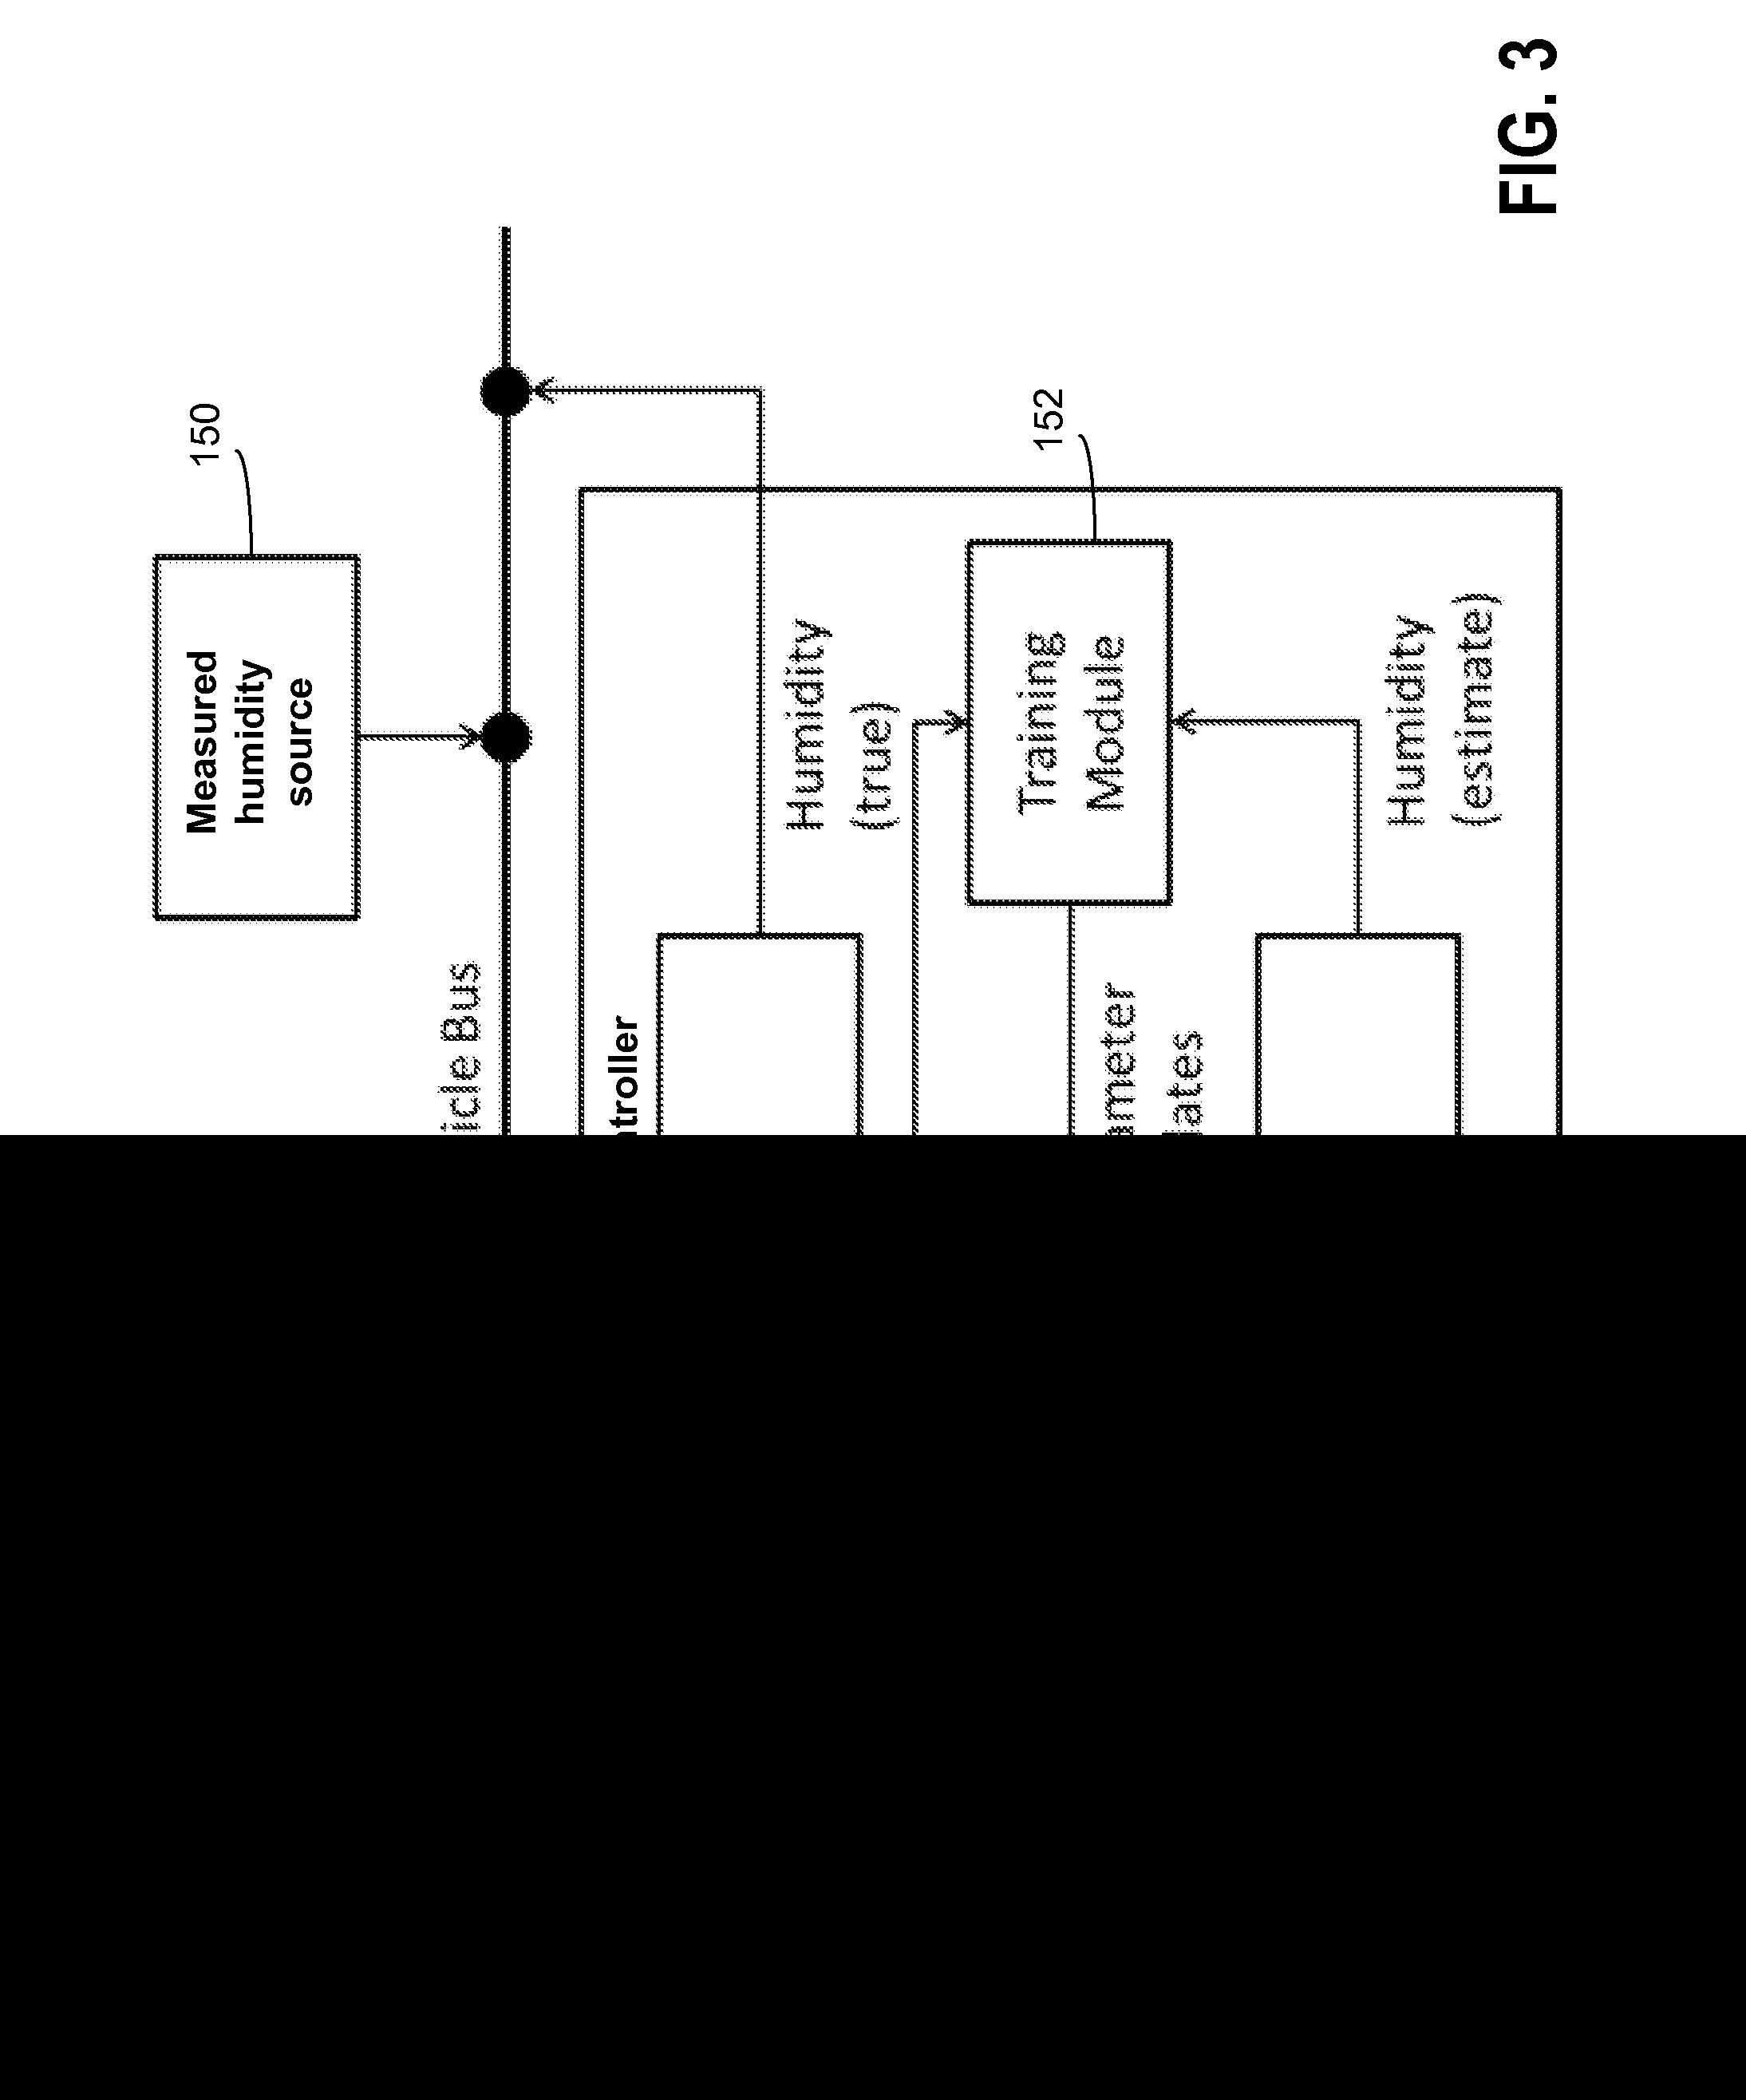 Halleffect Multiplier Circuit Diagram Tradeoficcom Wiring Cable Short Detector Patent Us20140338644 Automotive Virtual Humidity Sensor Google